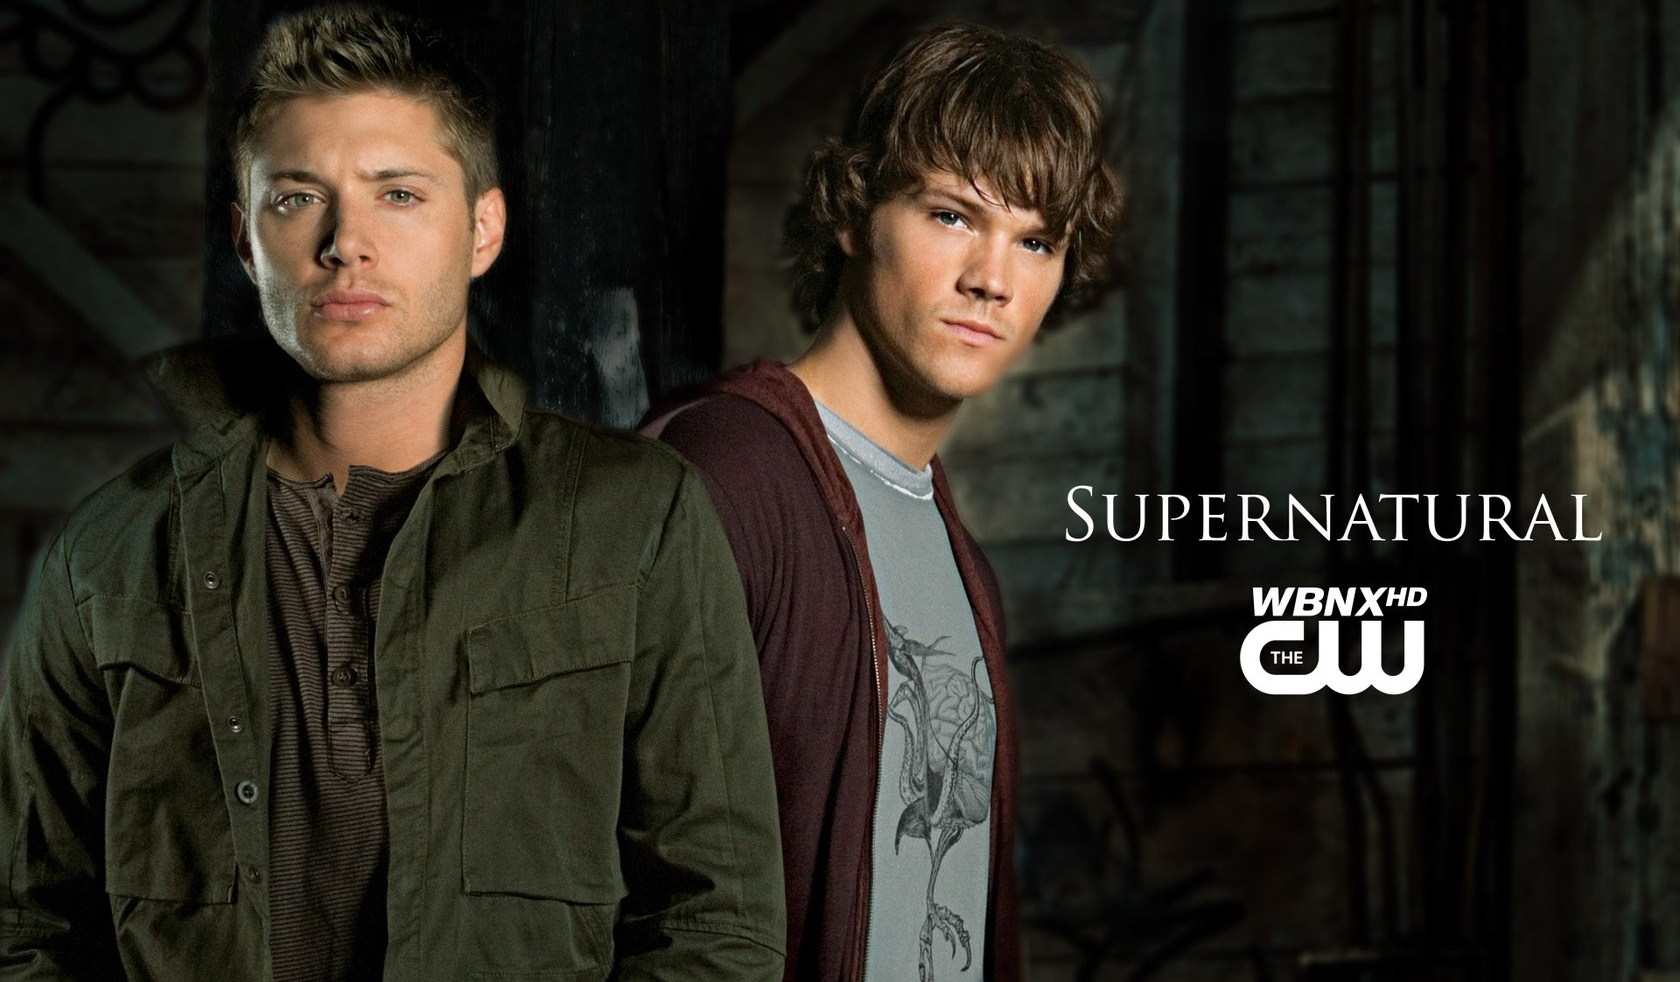 movies_films_s_supernatural_new_season_026500_-e1513521354394.jpg